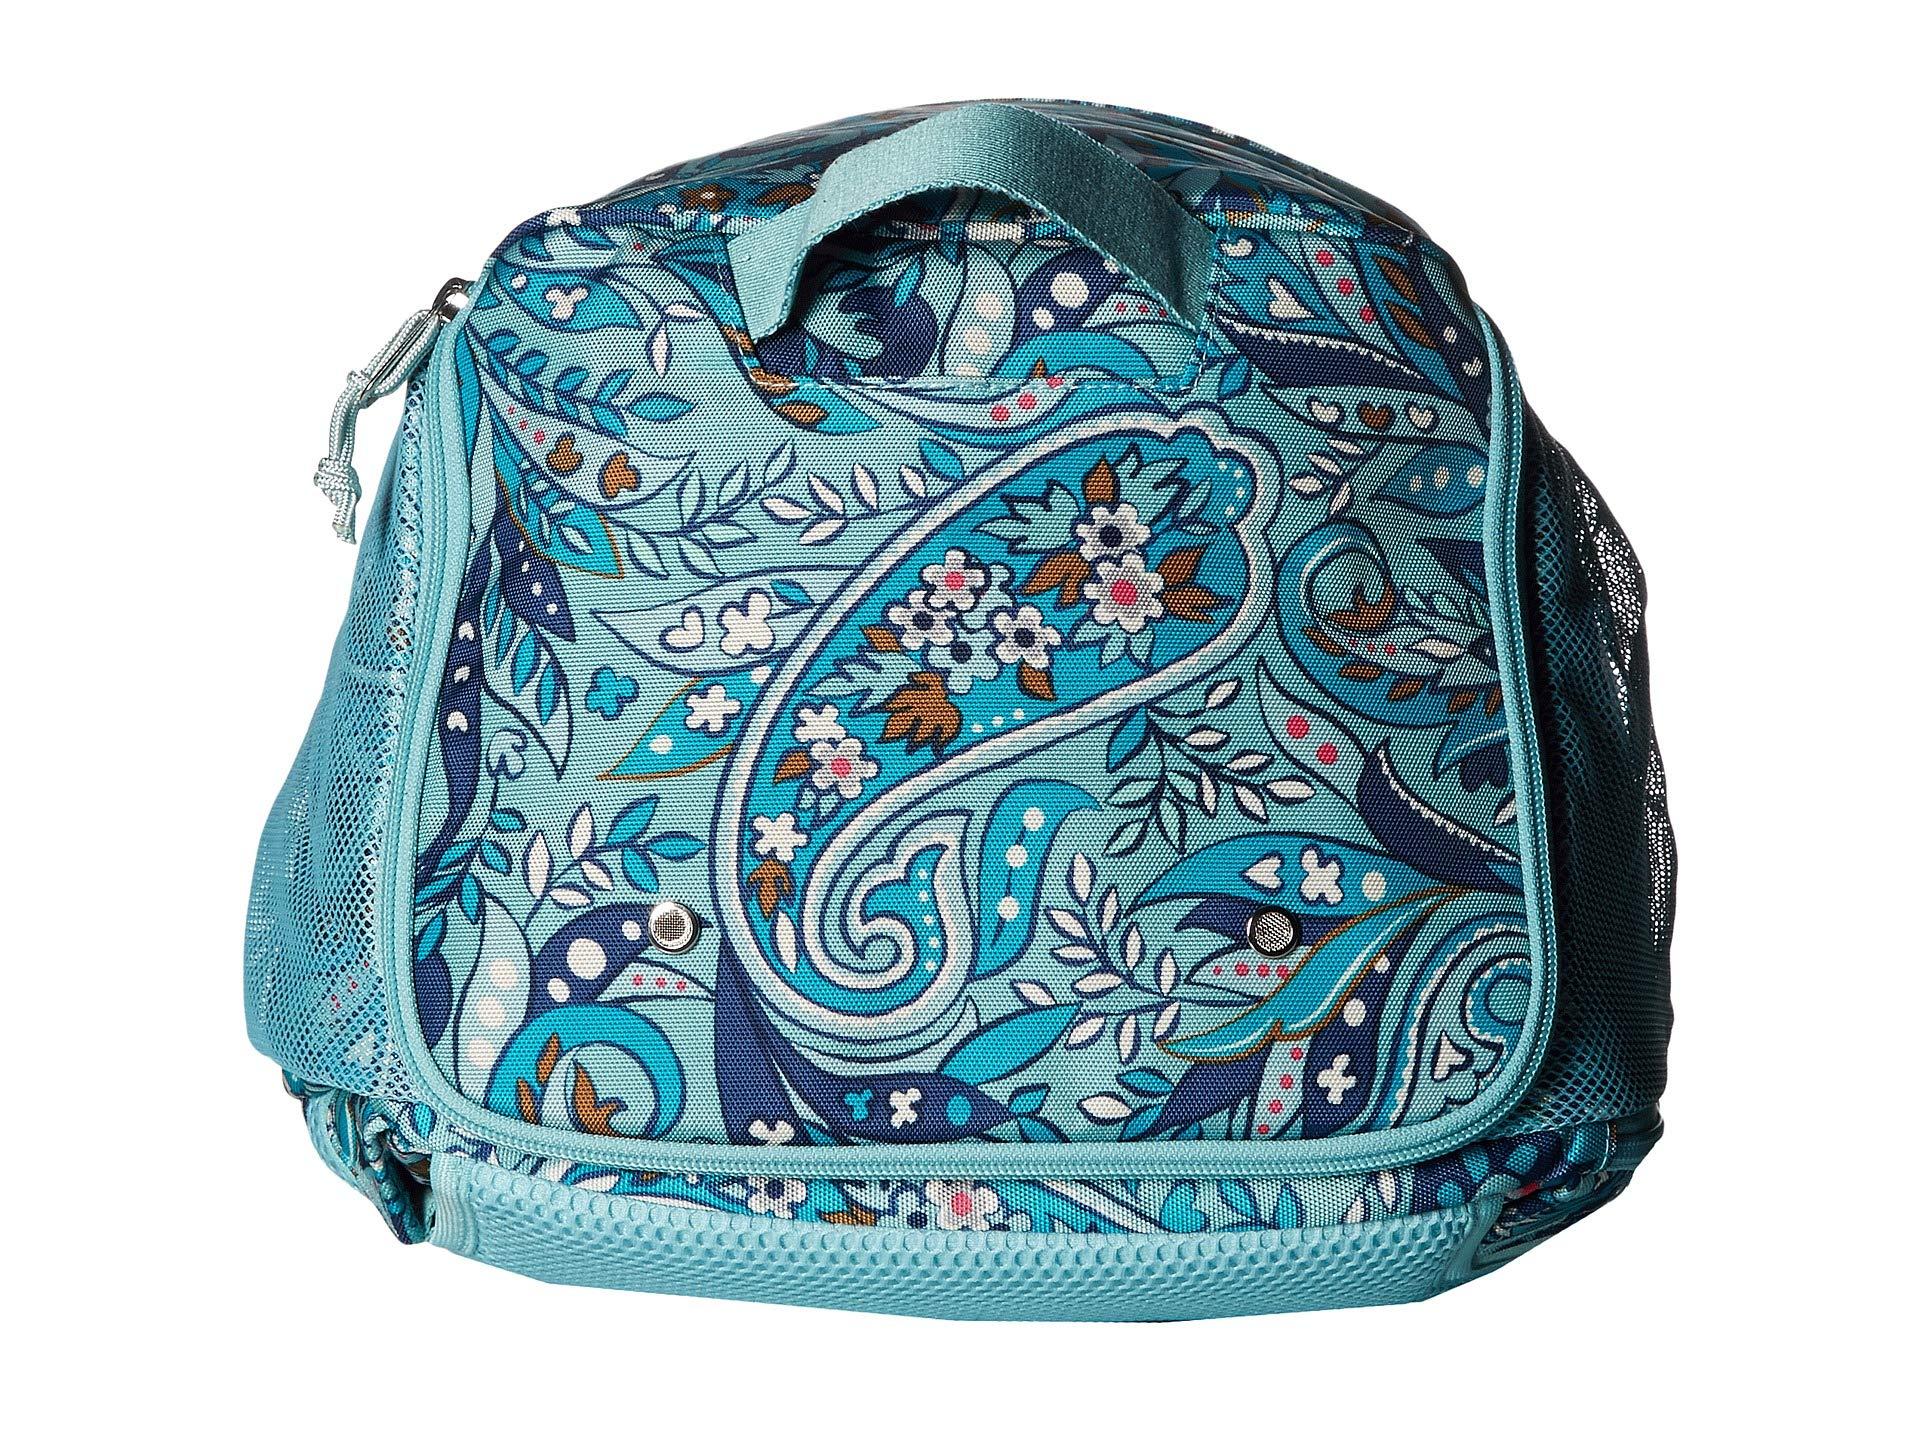 Up Backpack Lighten Daisy Paisley Journey Vera Bradley pwE0qnz